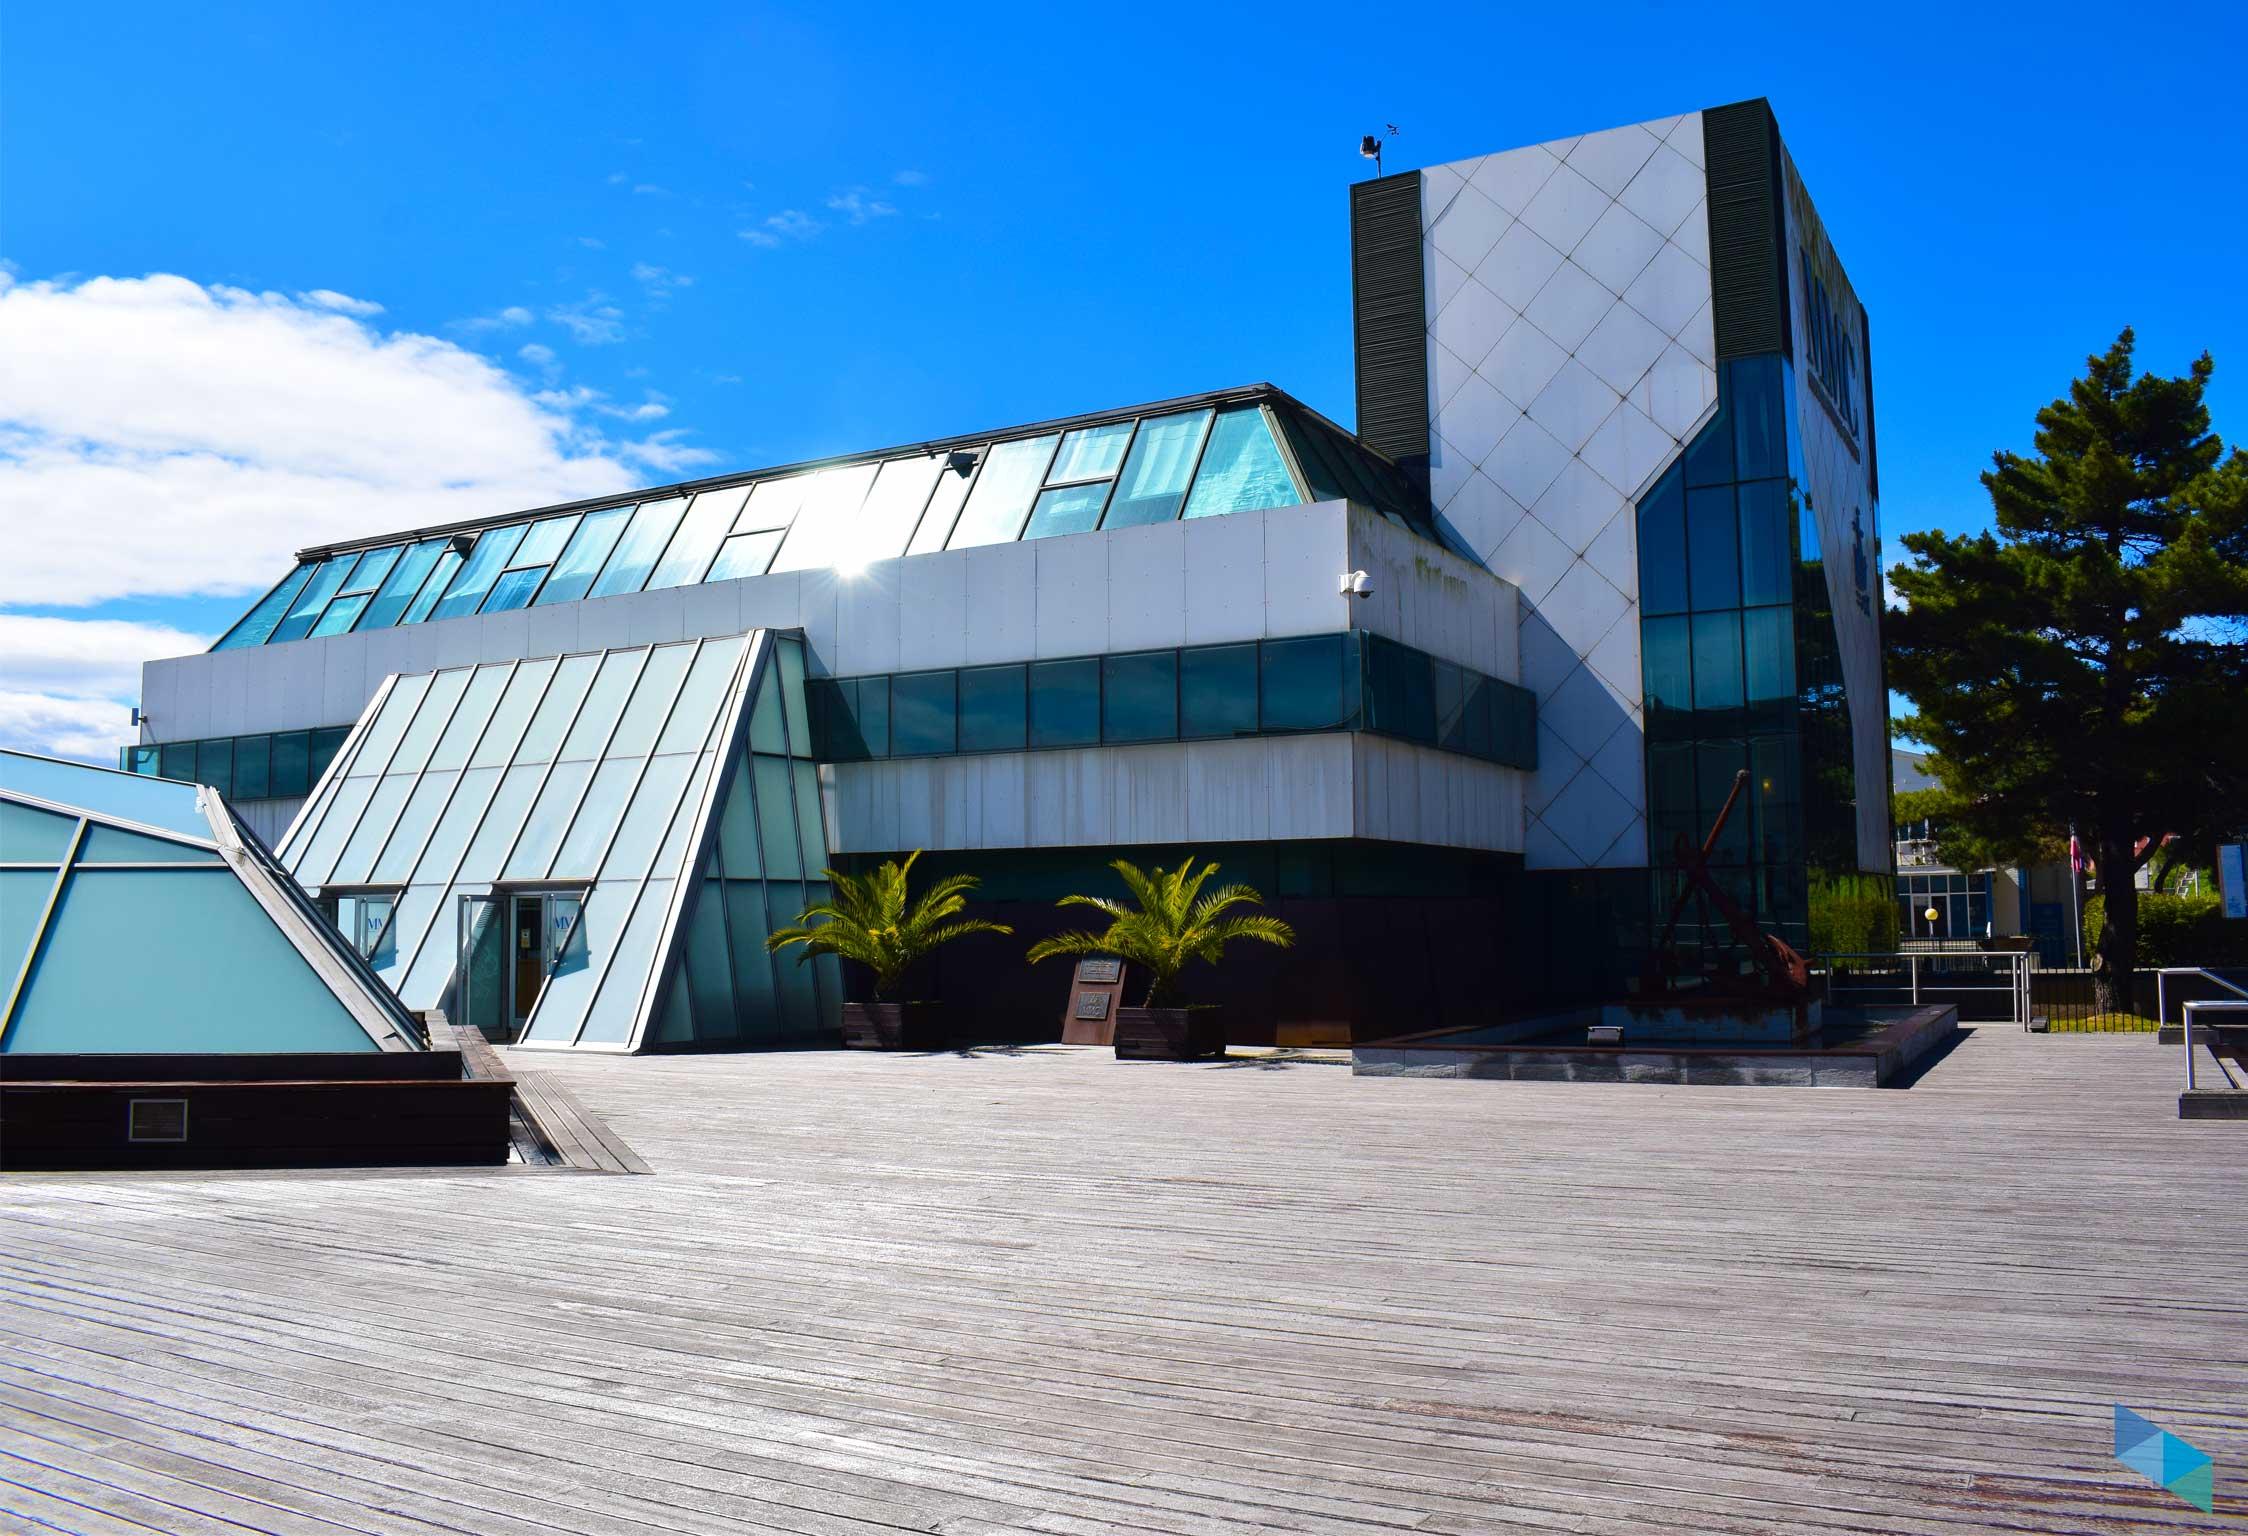 Museo Marítimo Santander like